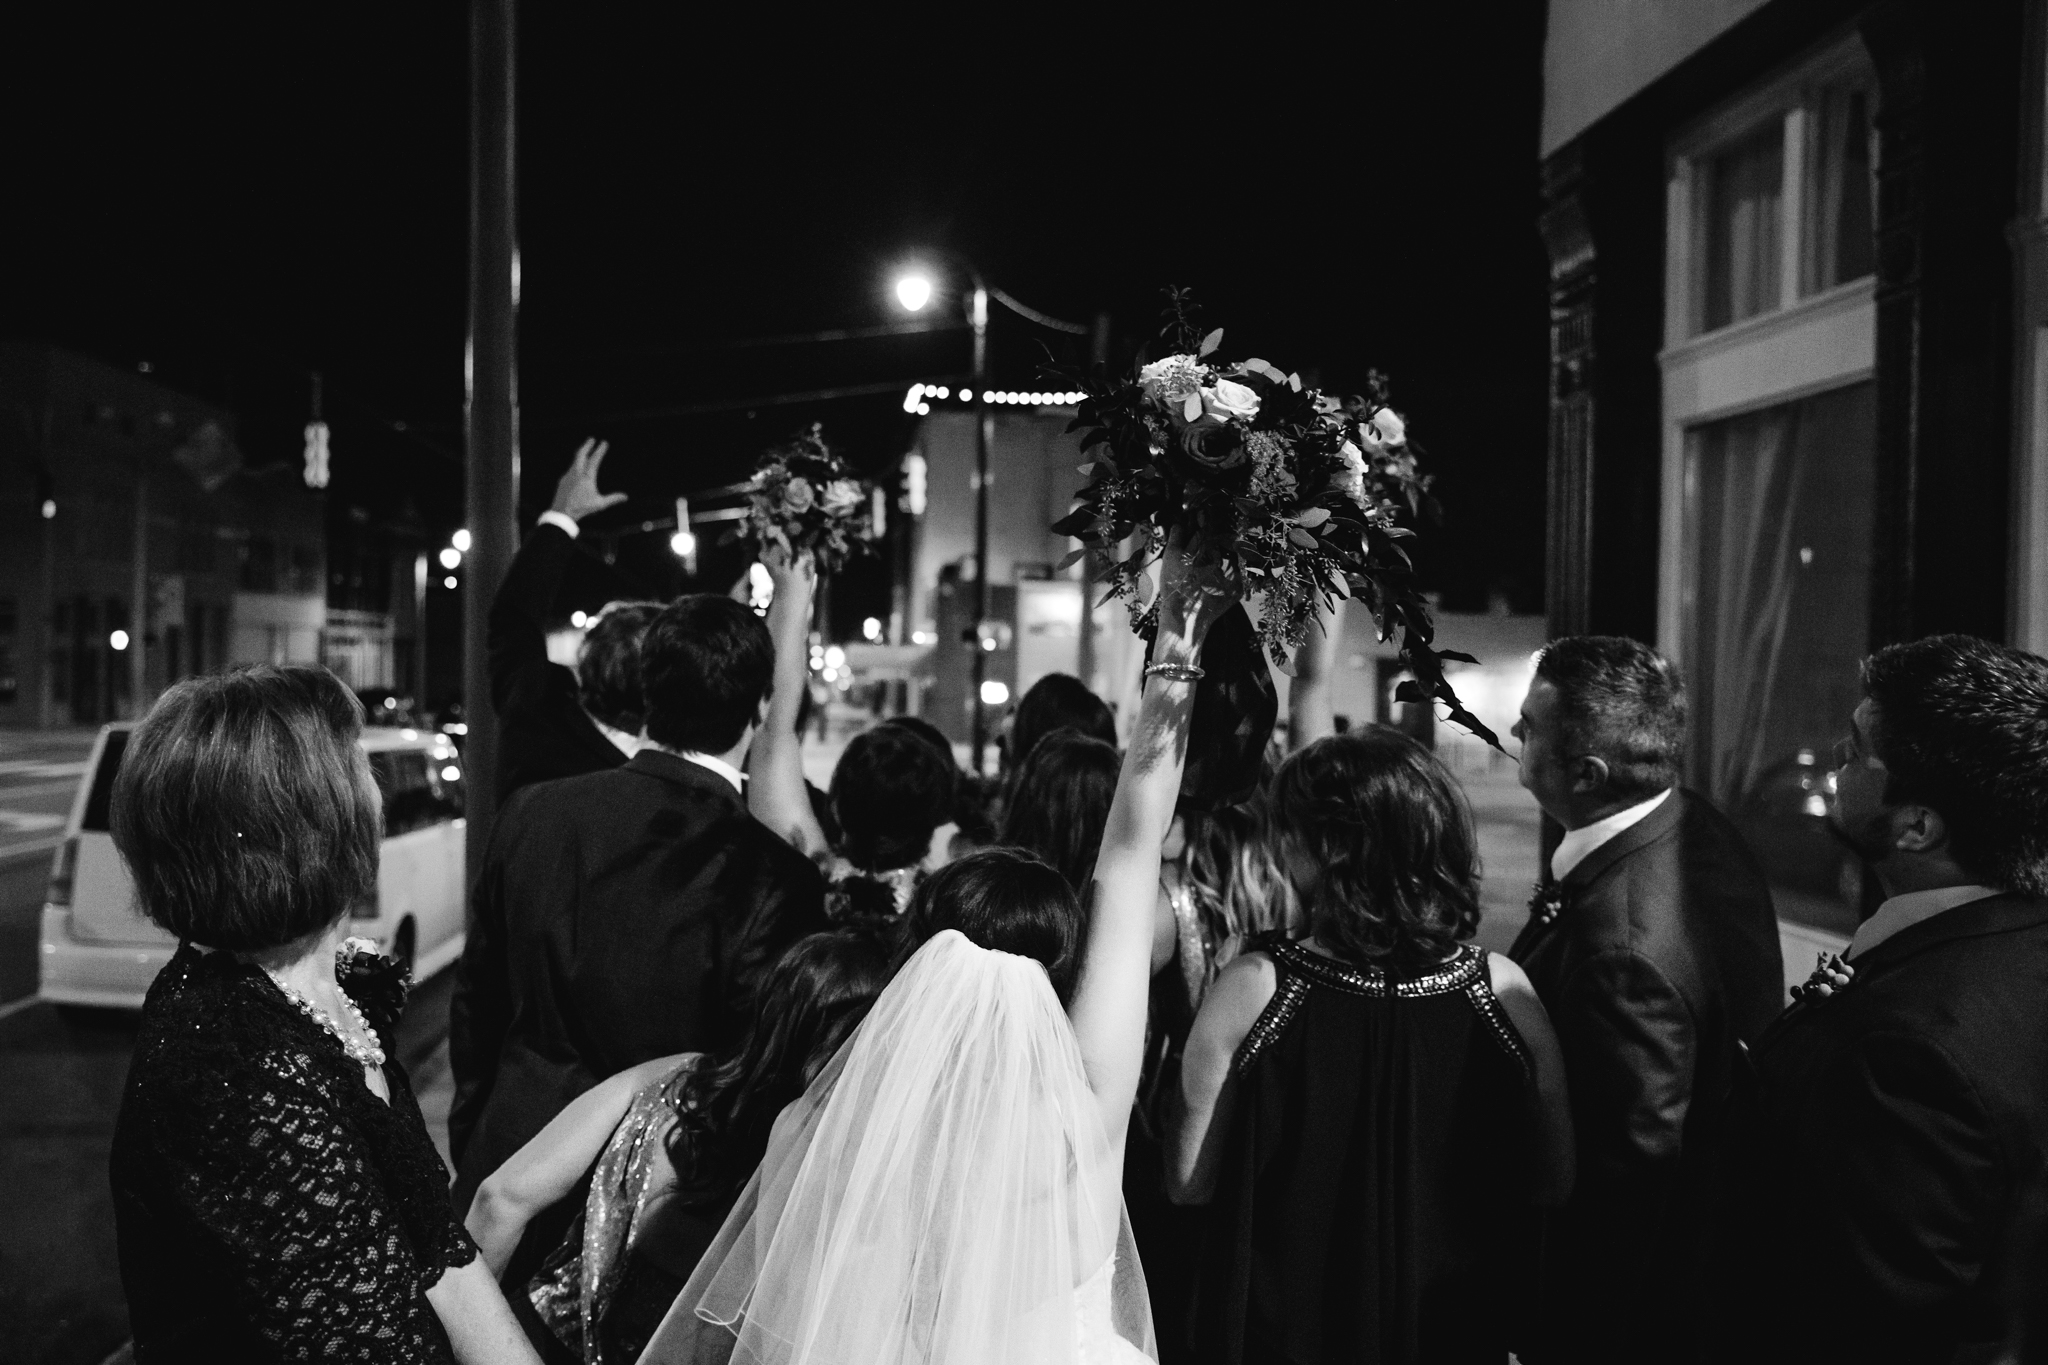 memphis-wedding-photographers-thewarmtharoundyou-ballinese-ballroom (169 of 232).jpg